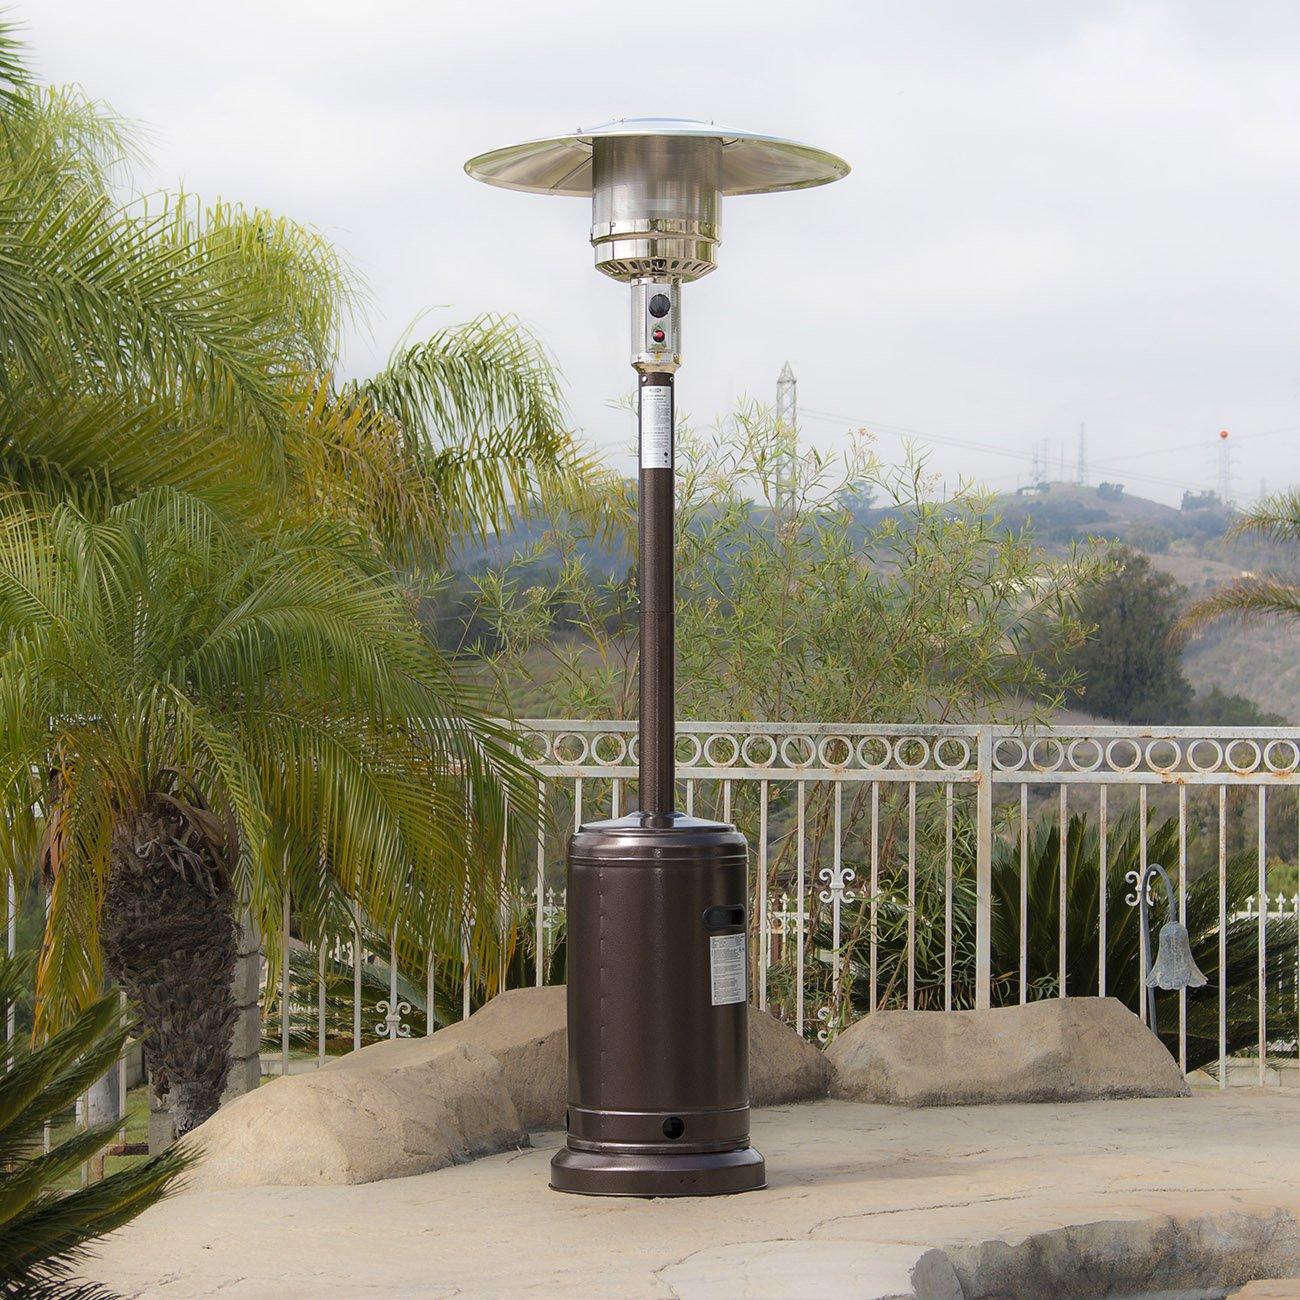 Belleze 48,000BTU Premium Outdoor Patio Heater with Wheel LP Propane Heat CSA Certified, Hammered Bronze by Belleze